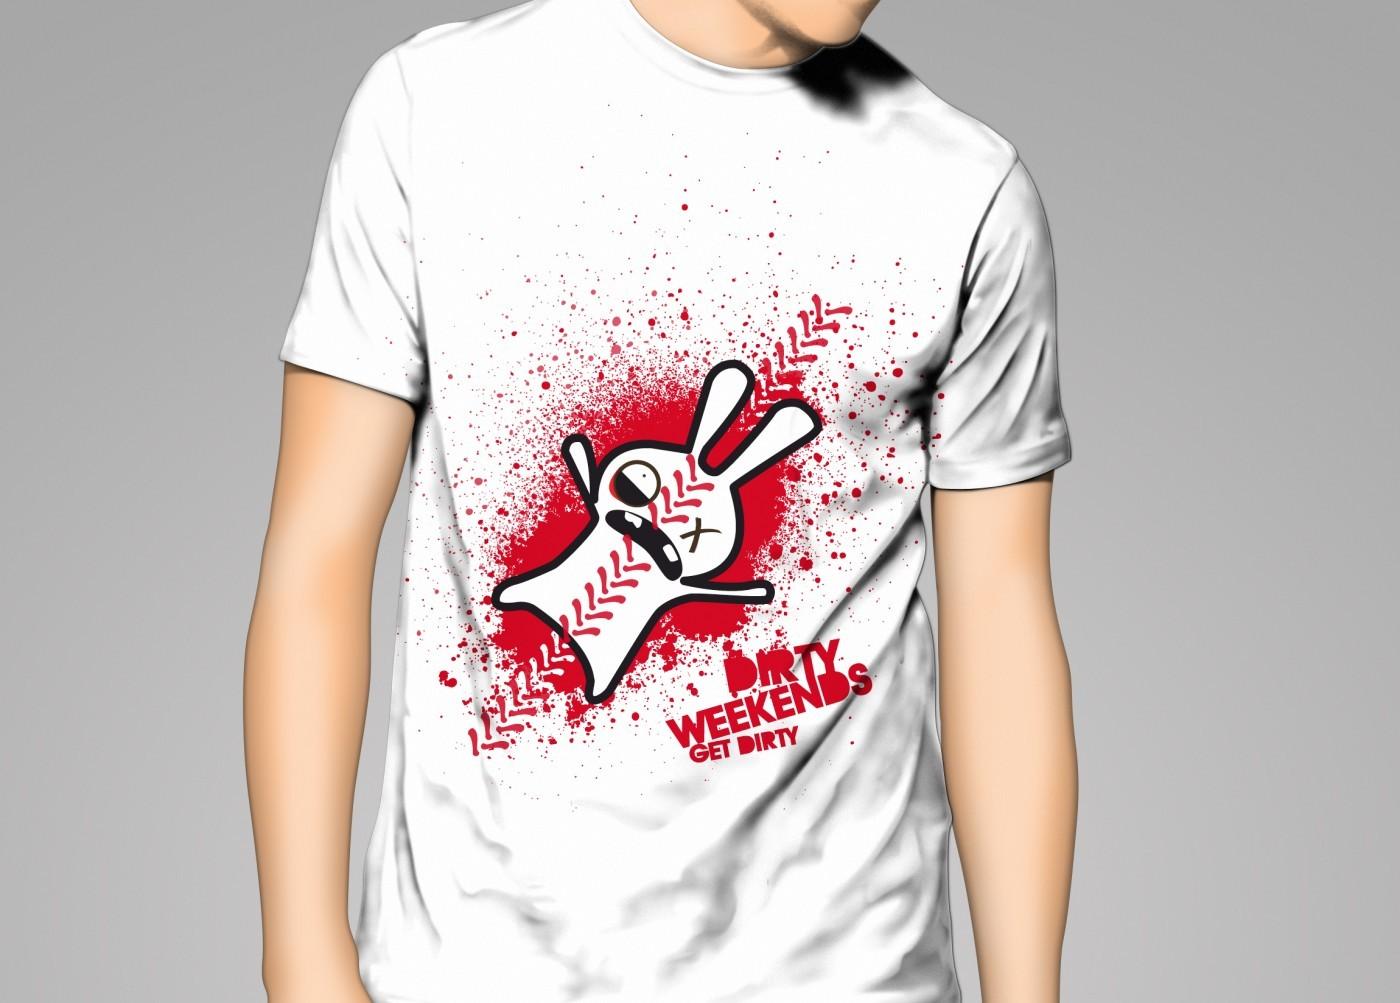 camiseta-1-1400x1004